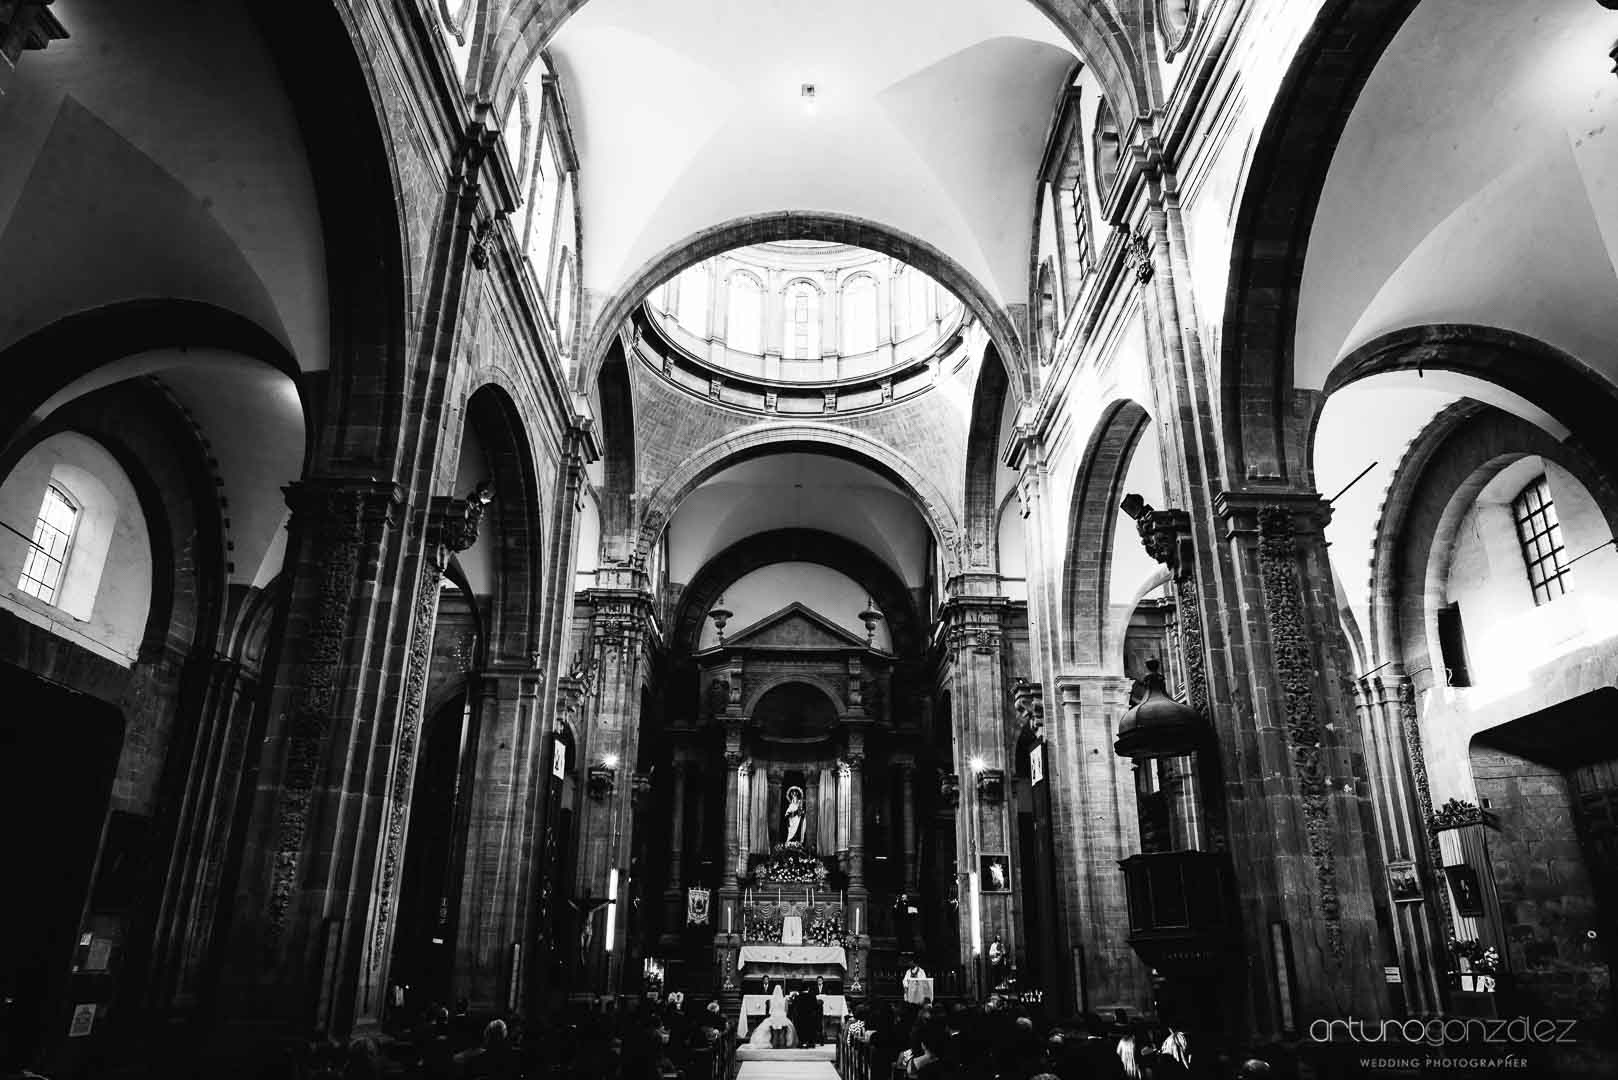 fotografo-de-bodas-en-guanajuato-71